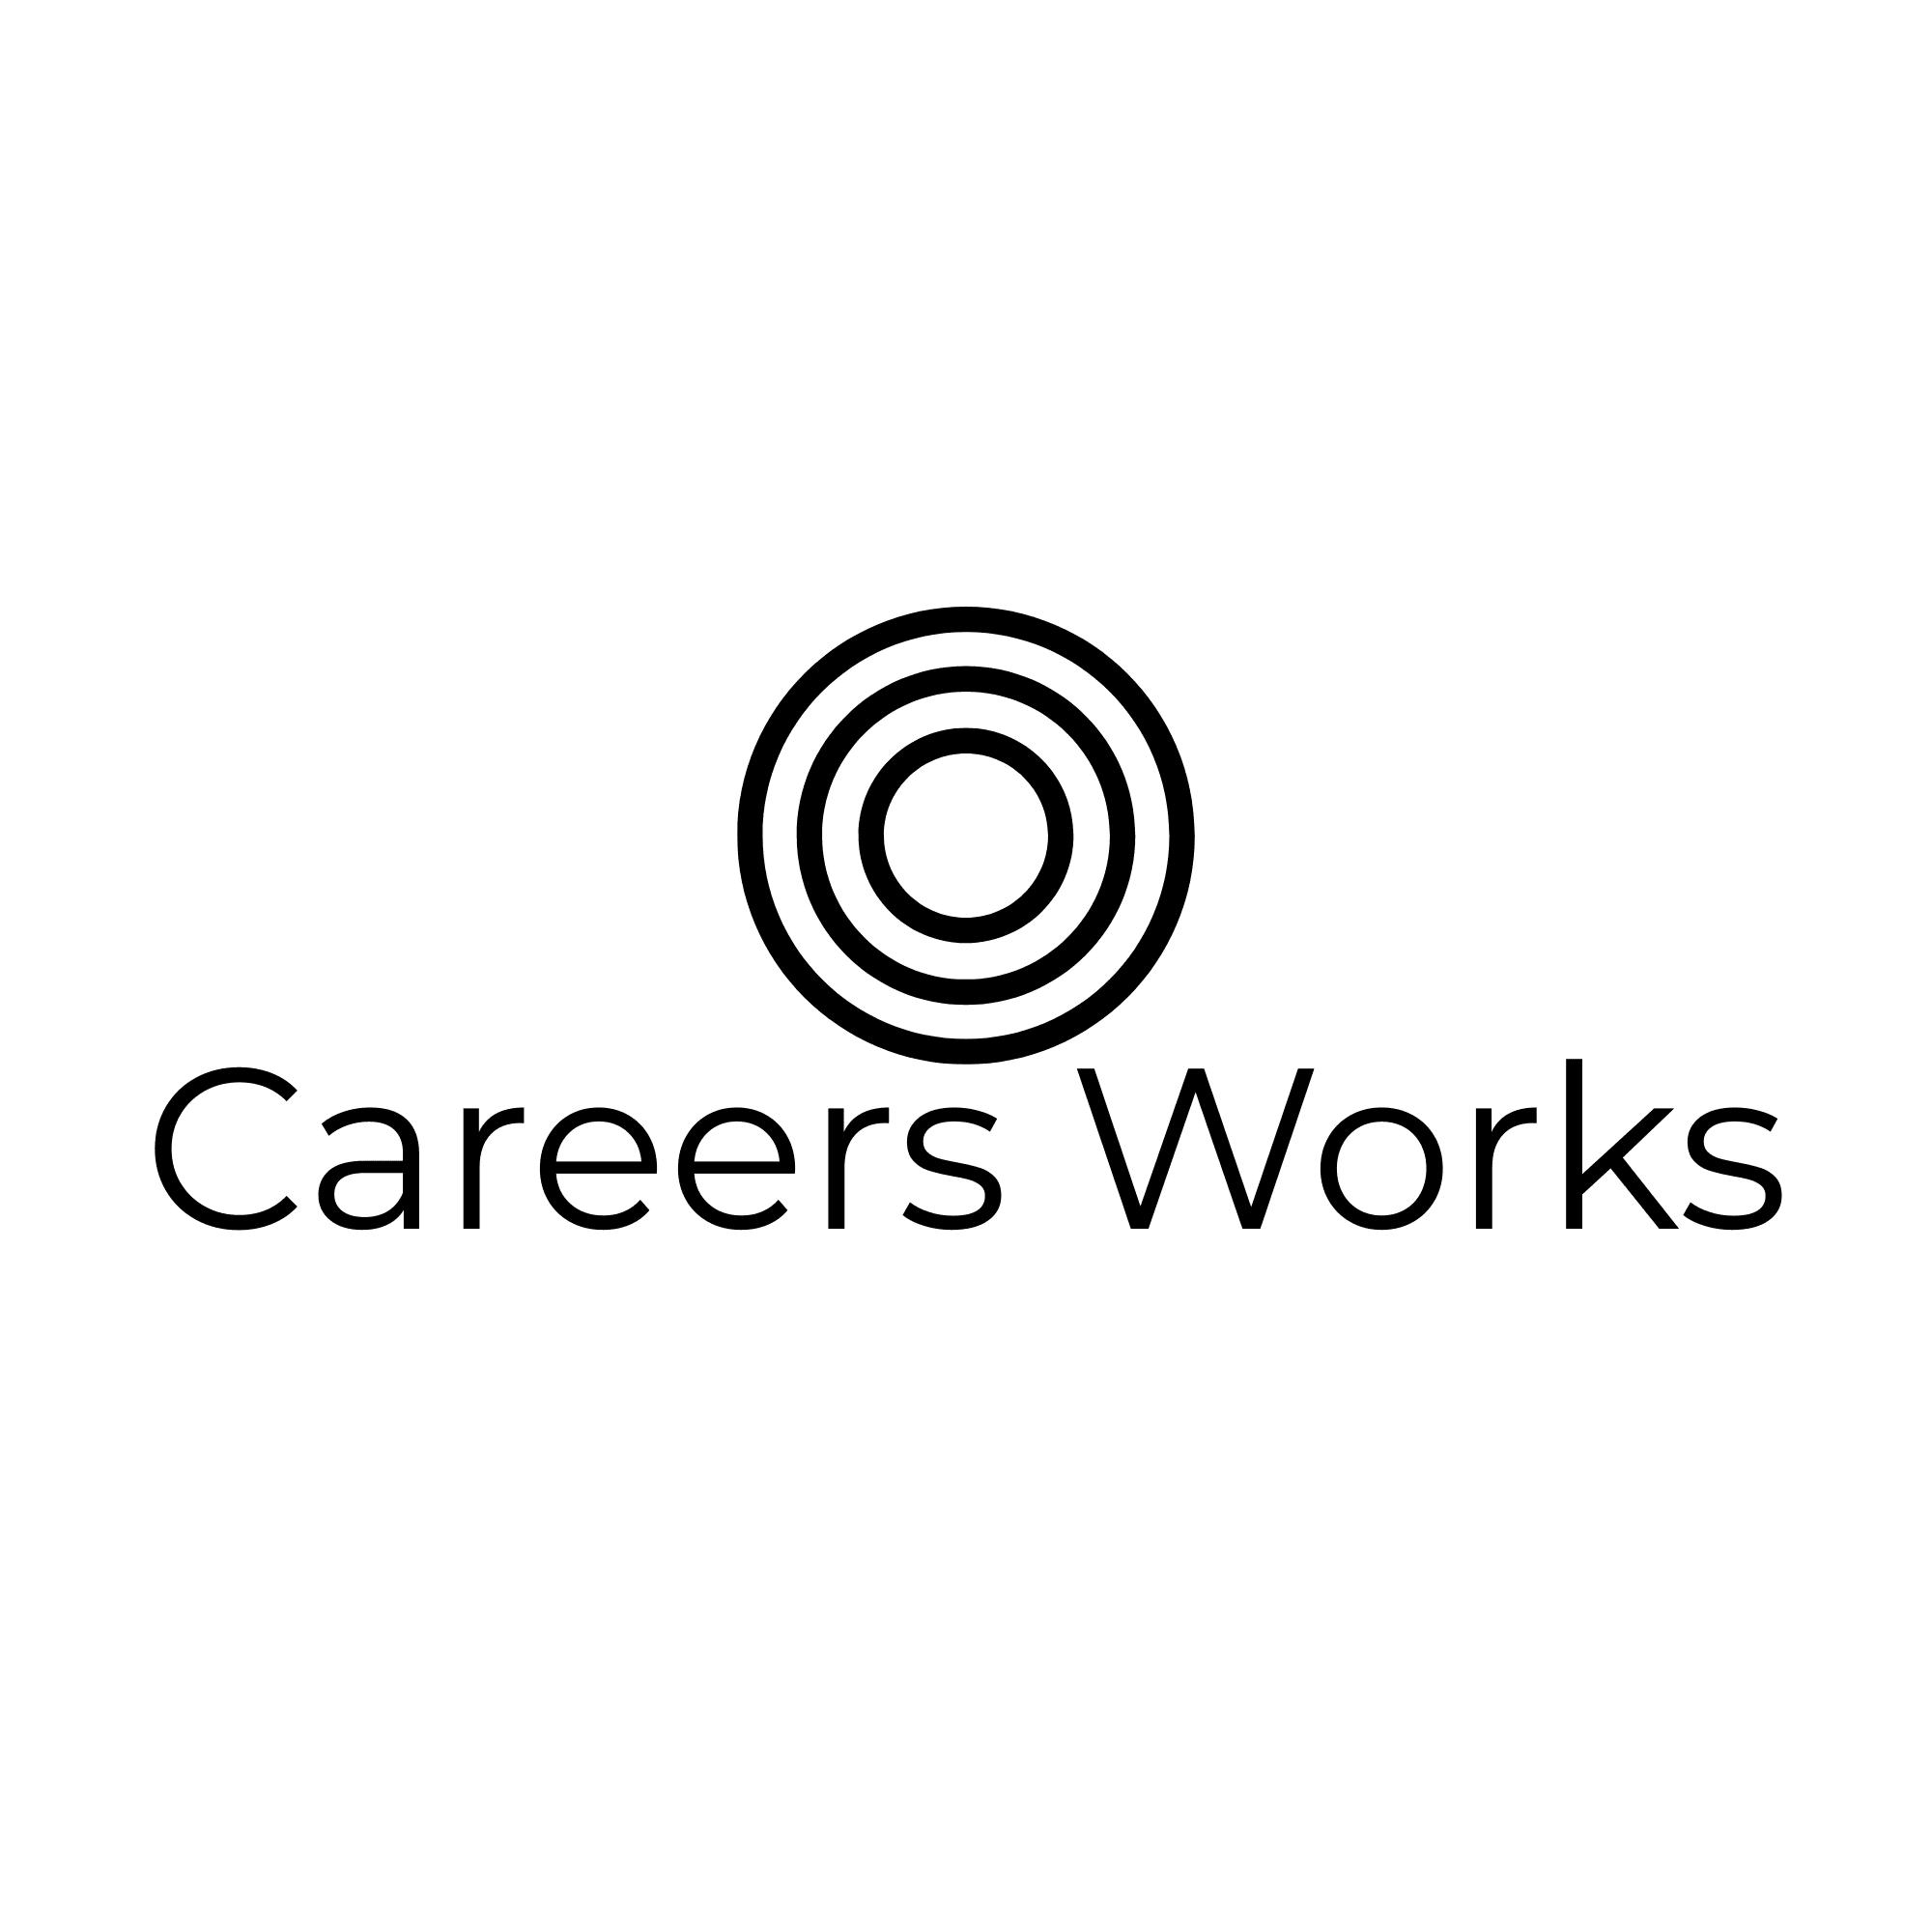 Andy Fosterjohn Careers Works - Pontypridd, West Glamorgan CF37 2DH - 07977 371550 | ShowMeLocal.com